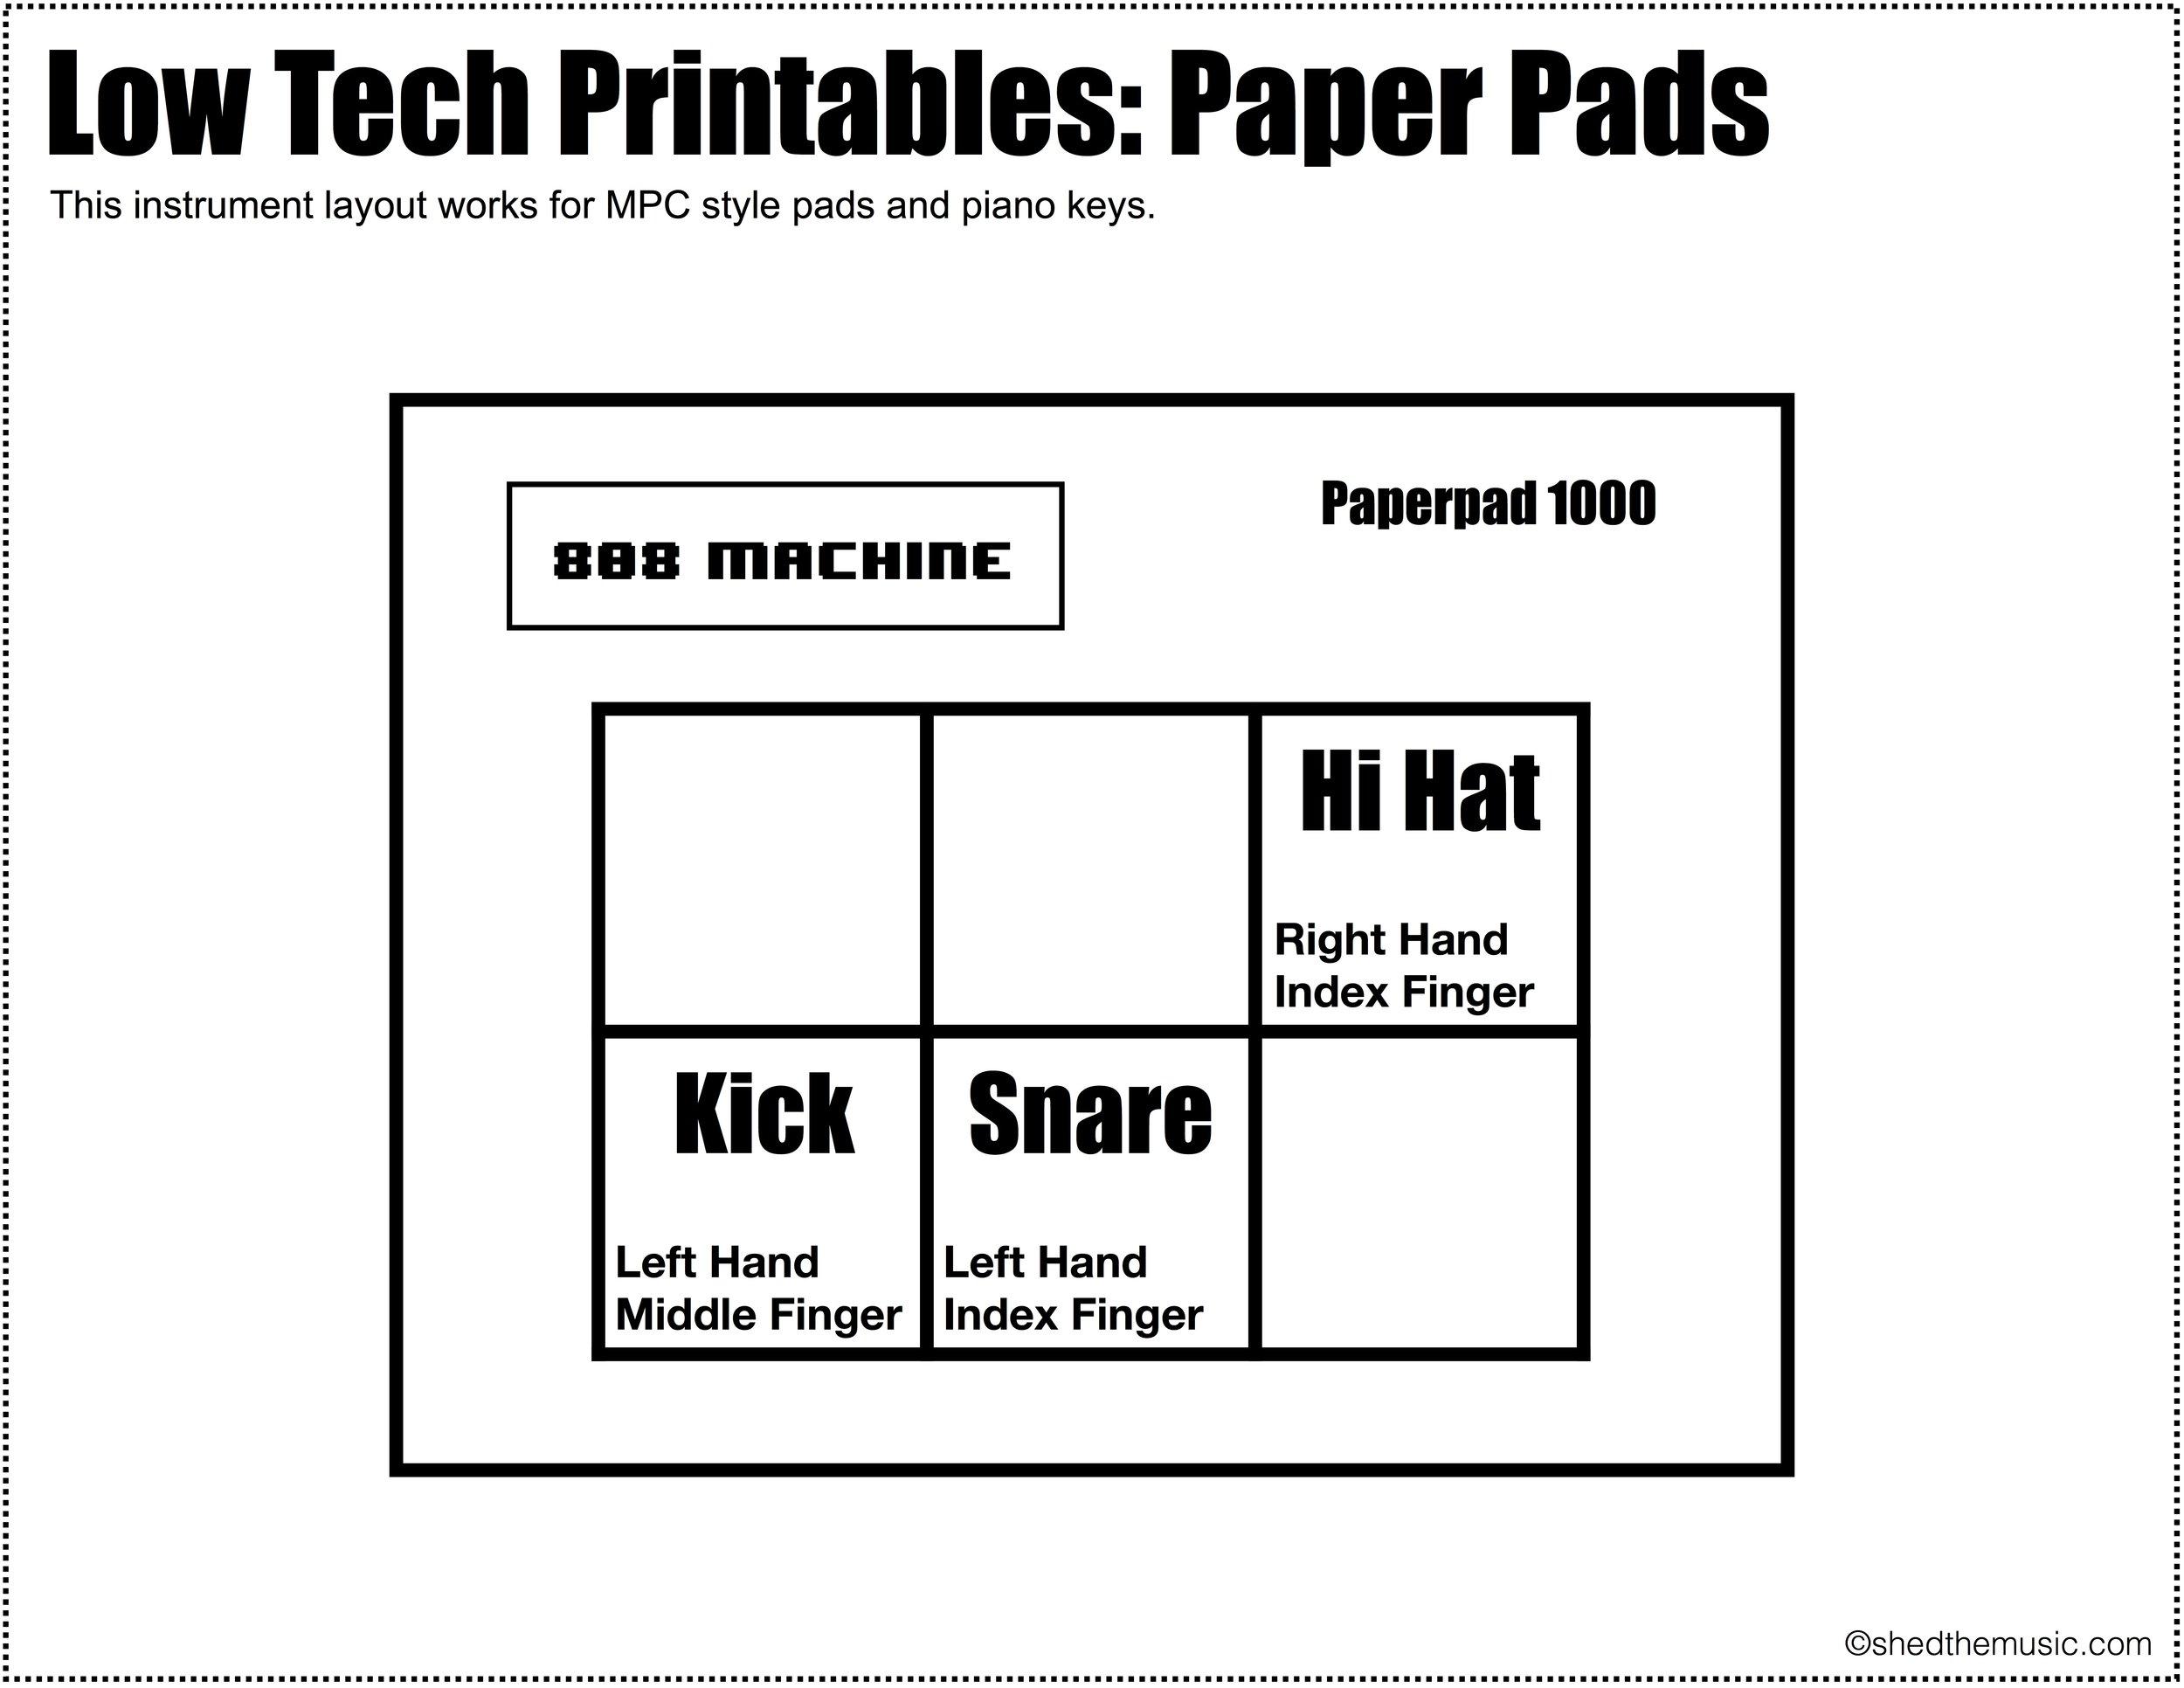 Paper+Pads.jpg